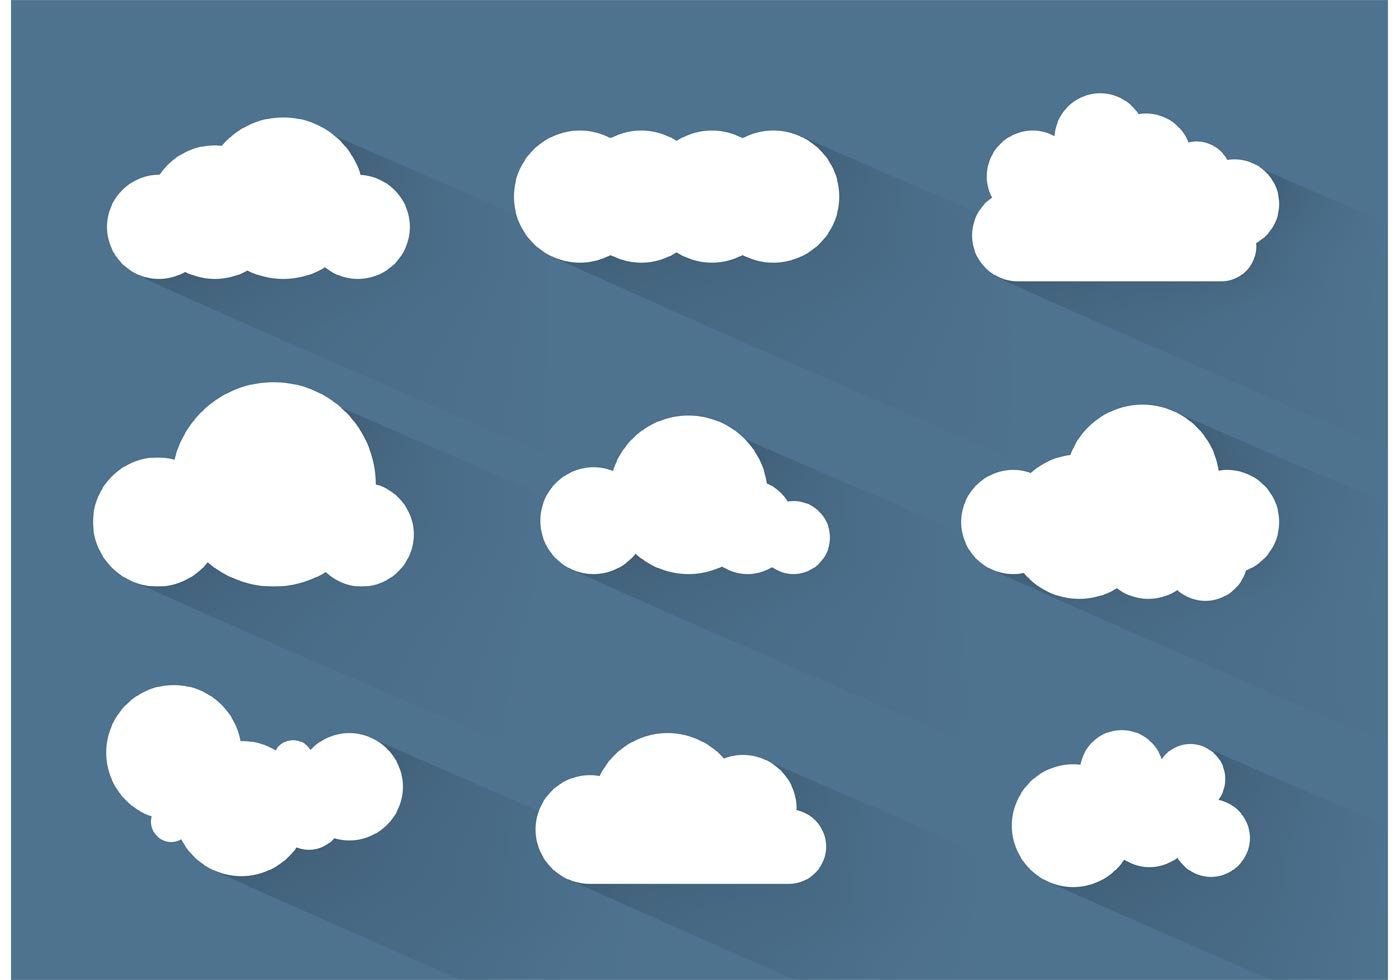 simpe cloud vectors download free vector art stock graphics images rh vecteezy com cloud vectors free download cloud vector free